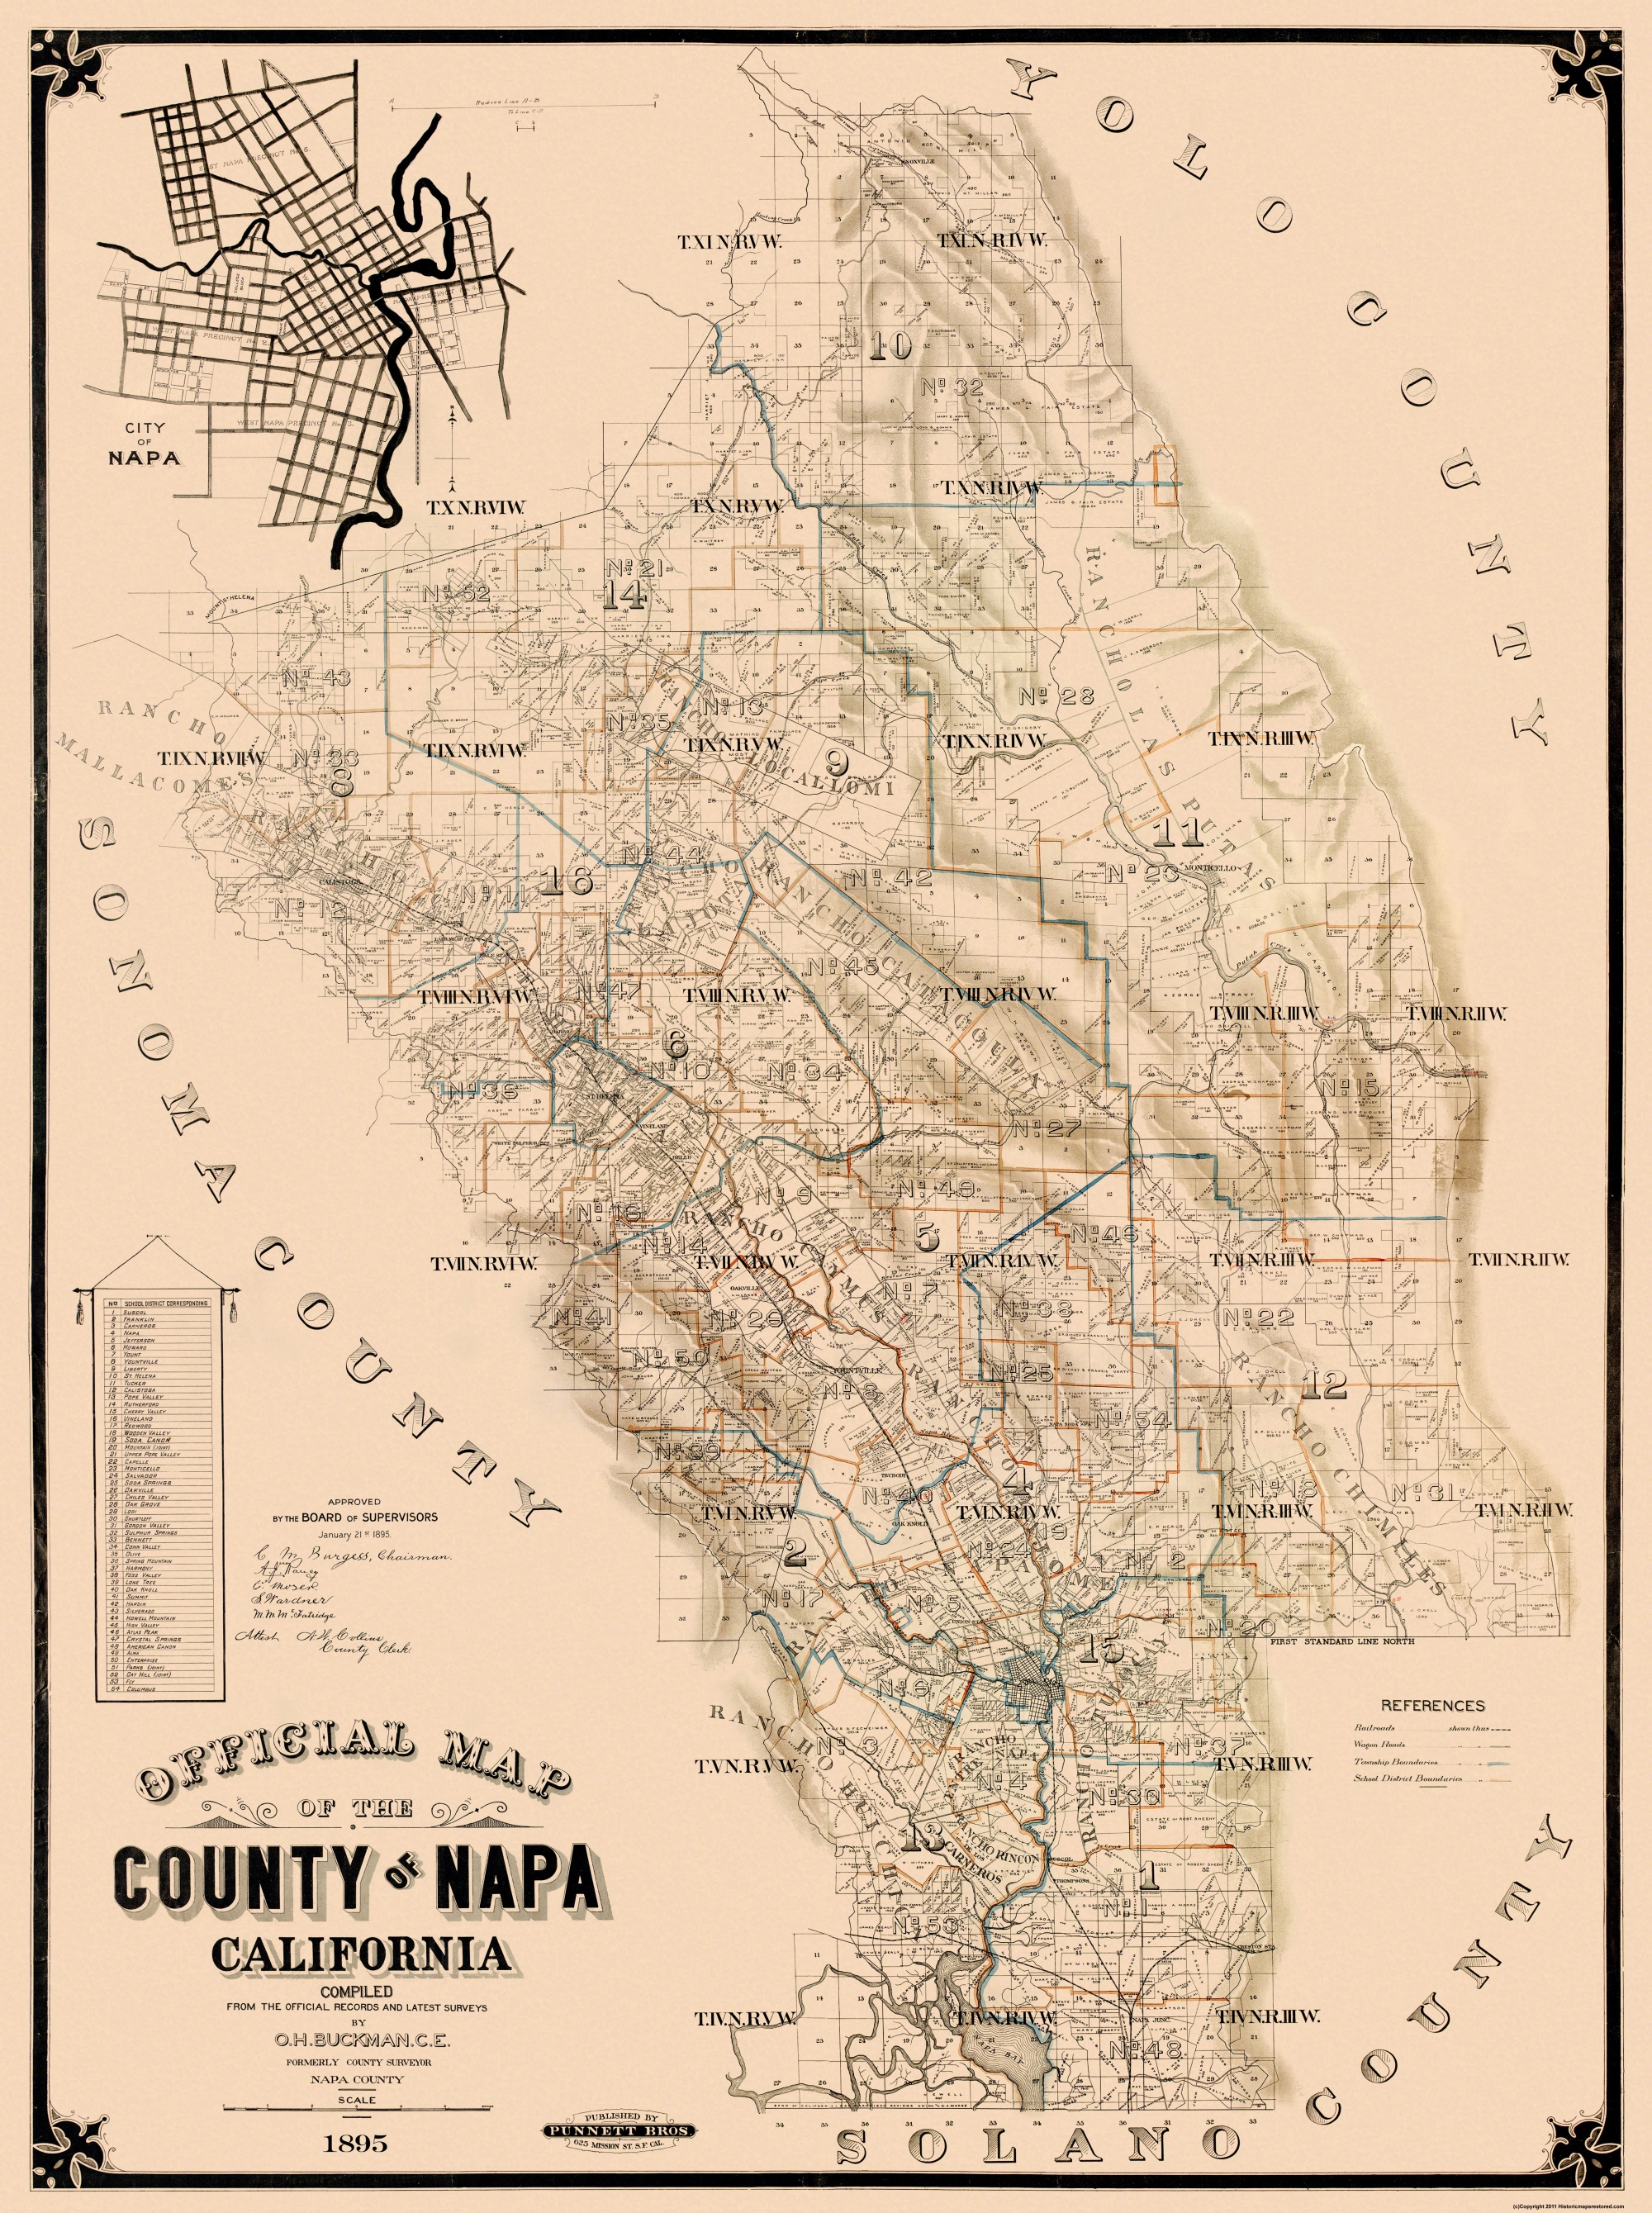 Old County Map - Napa California Landowner - 1895 - 23 x 30.81 on placer county, sequoia california map, lake tahoe california map, mendocino county, hollywood california map, texas map, sonoma california map, san diego california map, lake county, st. helena, alameda county, yosemite california map, monterey california map, solano county, northern california map, santa cruz, california appellation map, santa barbara county, wineries in napa map, yountville california map, san francisco, california map, sonoma county, santa rita hills california map, mount lassen california map, california california map, san francisco bay area, lake berryessa, orange county, sacramento county, contra costa county, alcatraz island california map, ventura county, marin county, san mateo county, monterey county, downtown napa california map, northern california, california wine country map, st. helena california map,